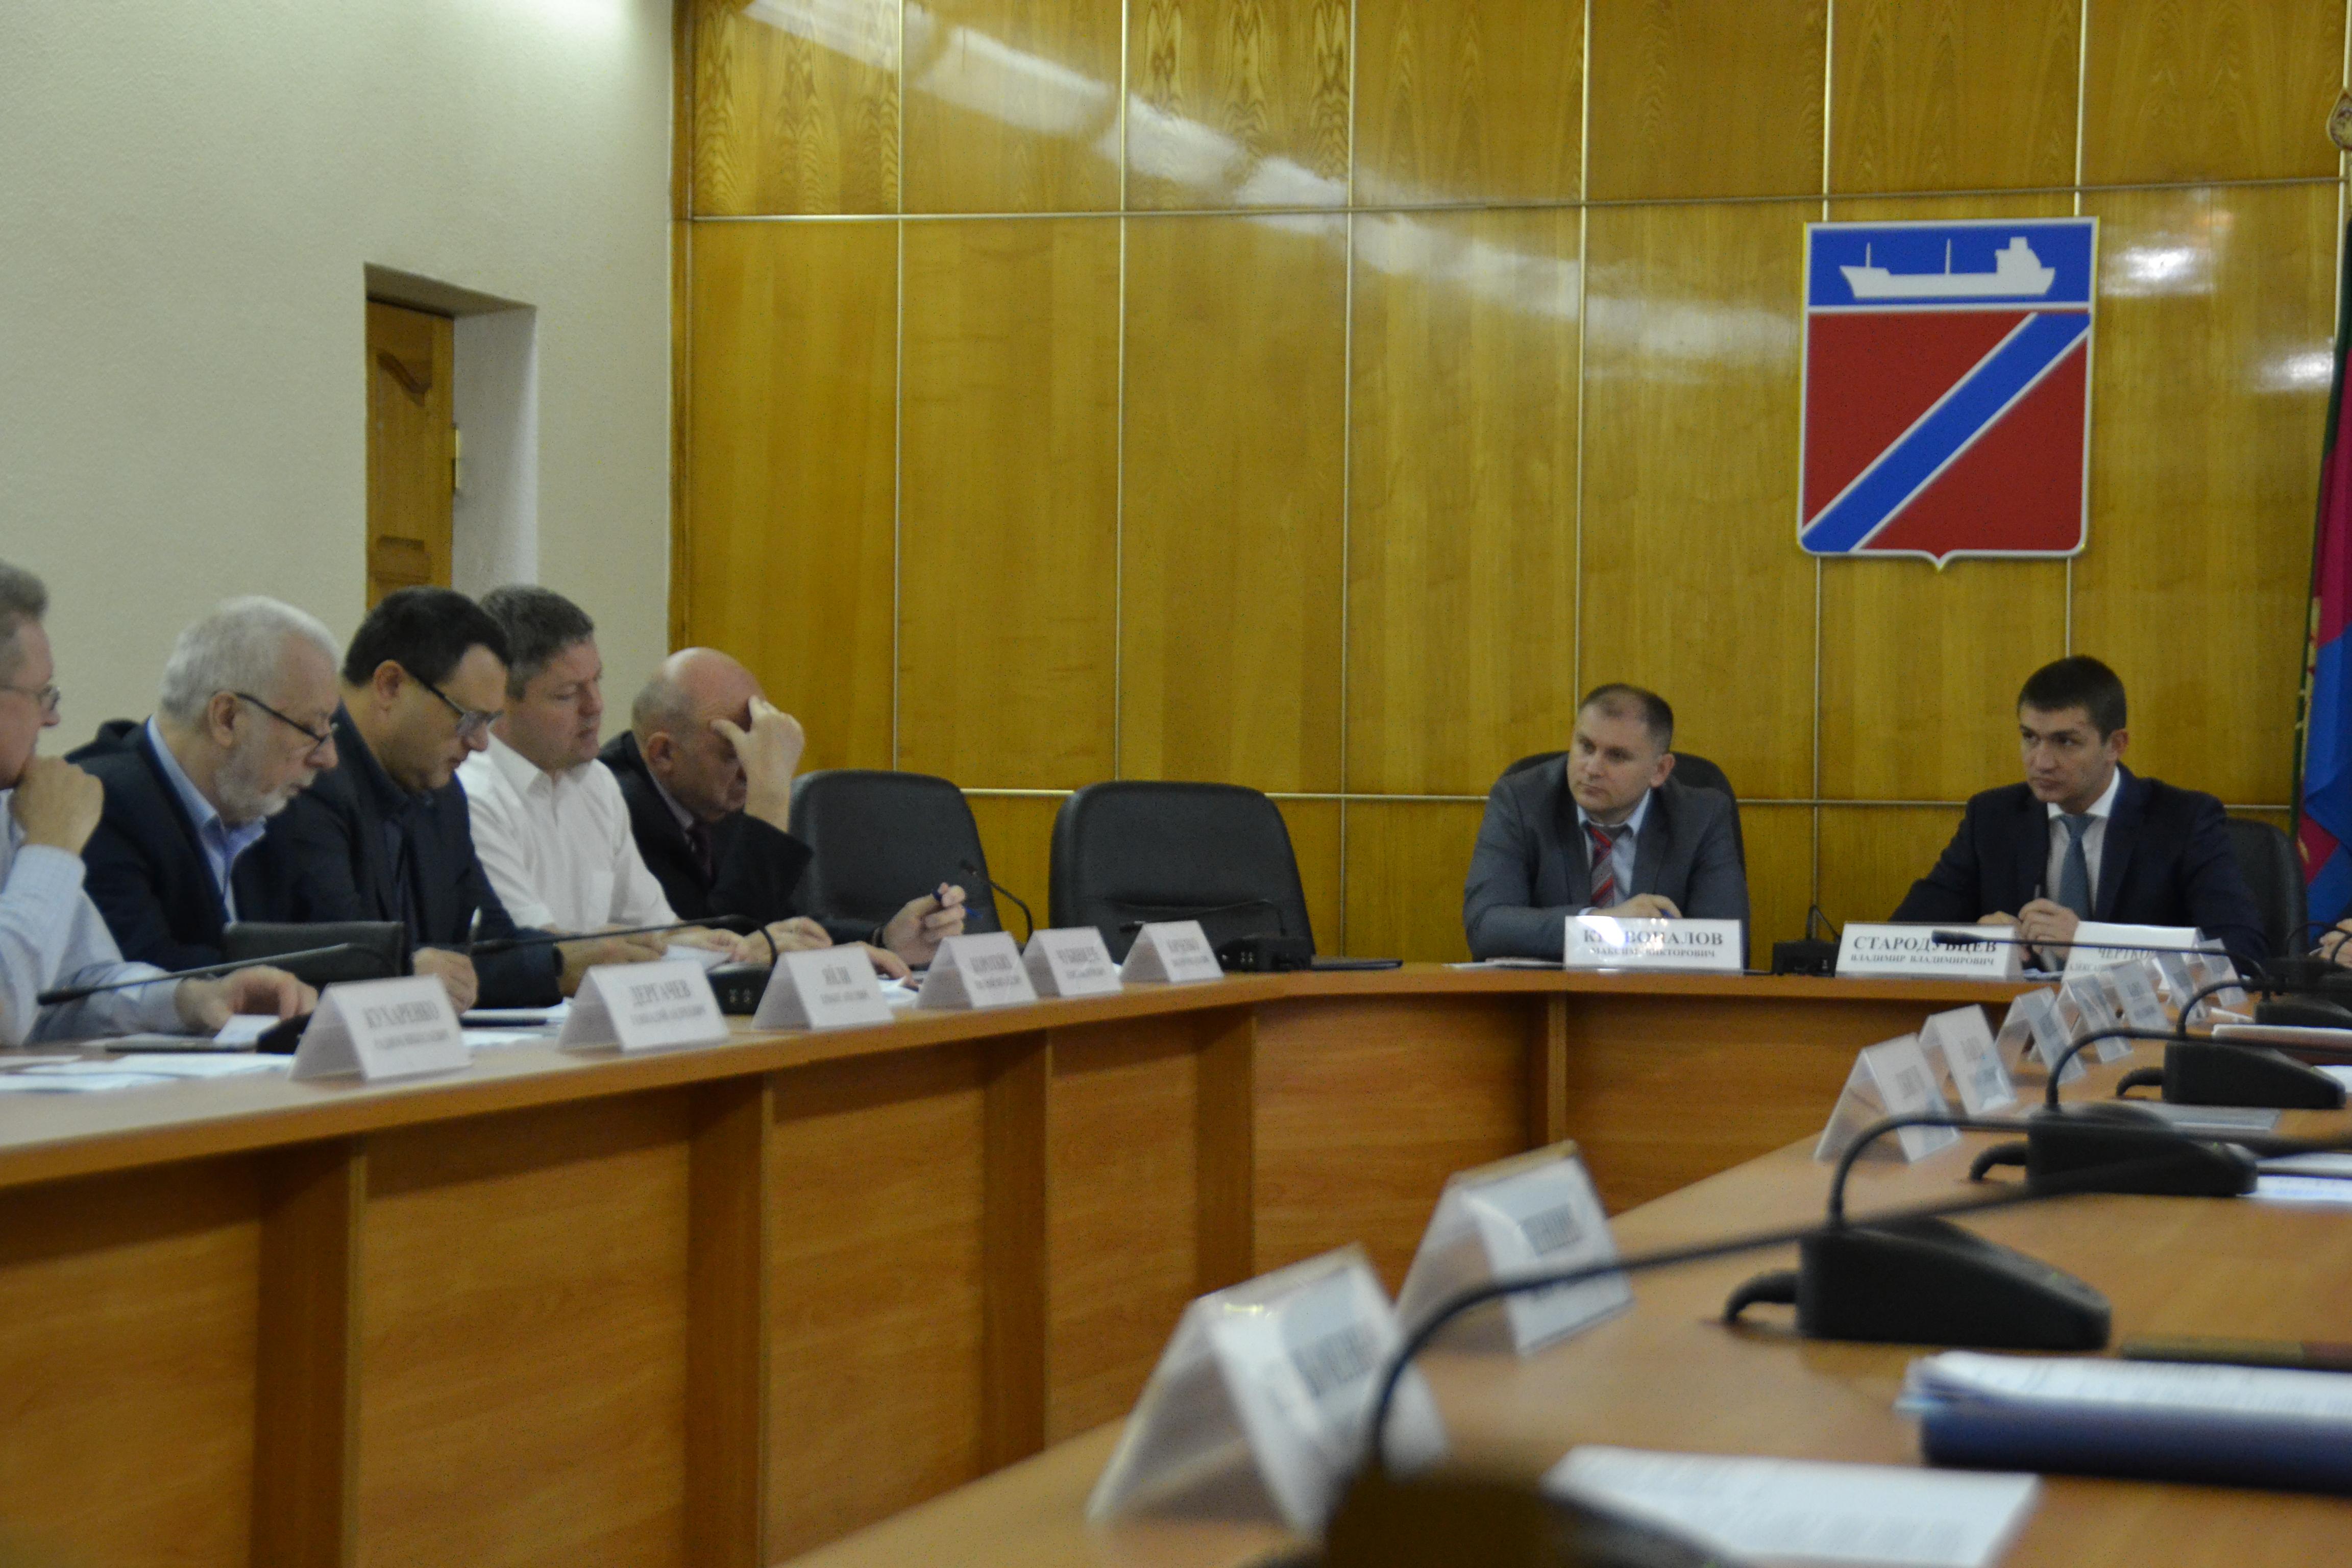 Состоялось 28 заседание Совета города Туапсе